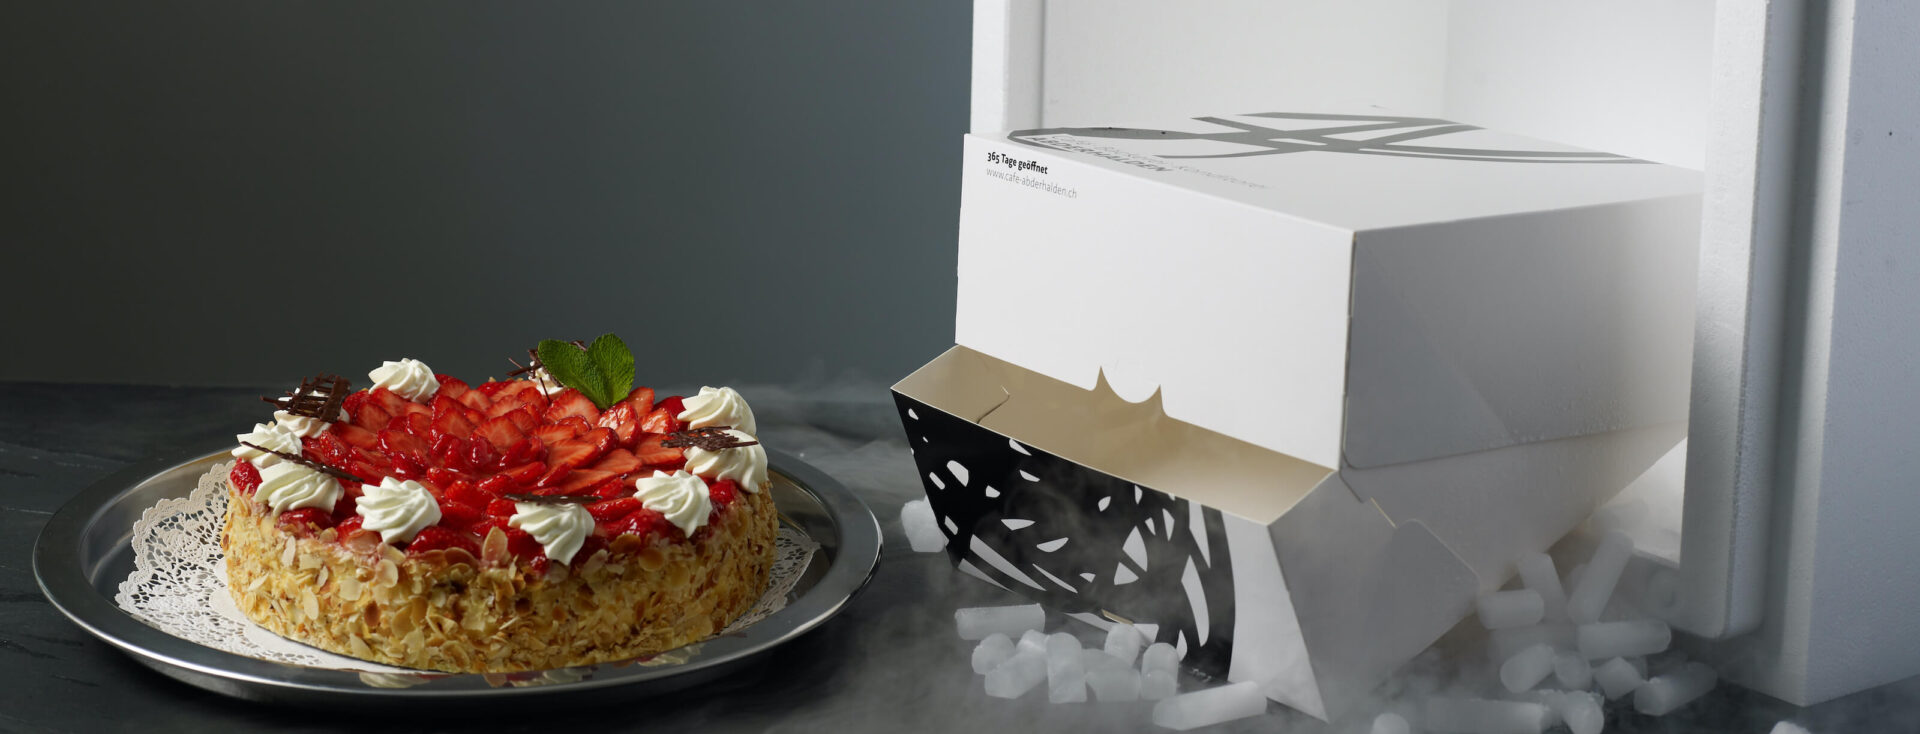 Erdbeertorte versand kuchen gekühlt polarjet trockeneis